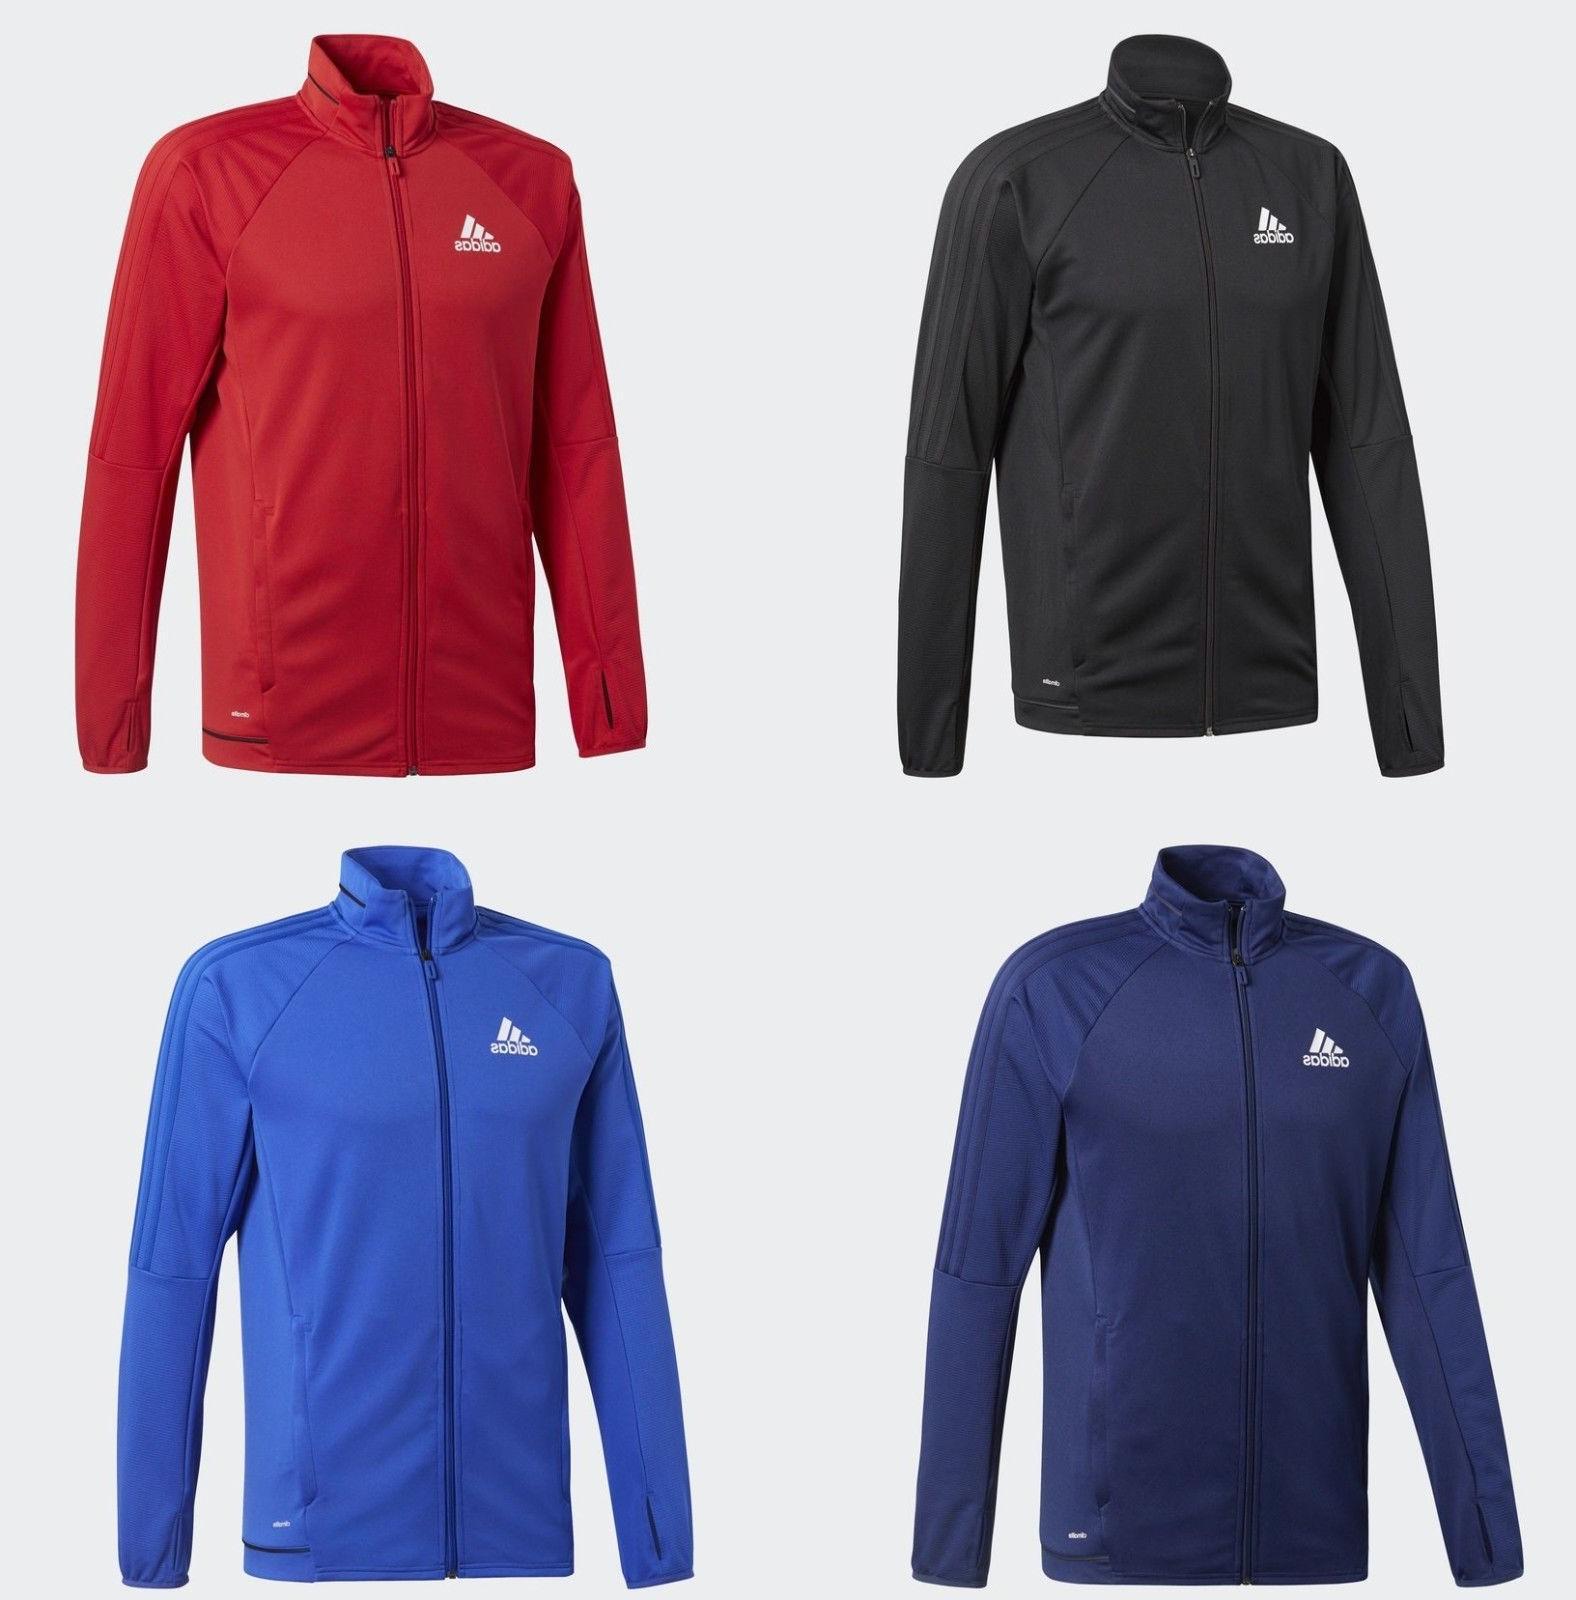 Adidas Men's Tiro 17 Training Jacket Only Running Track Suit